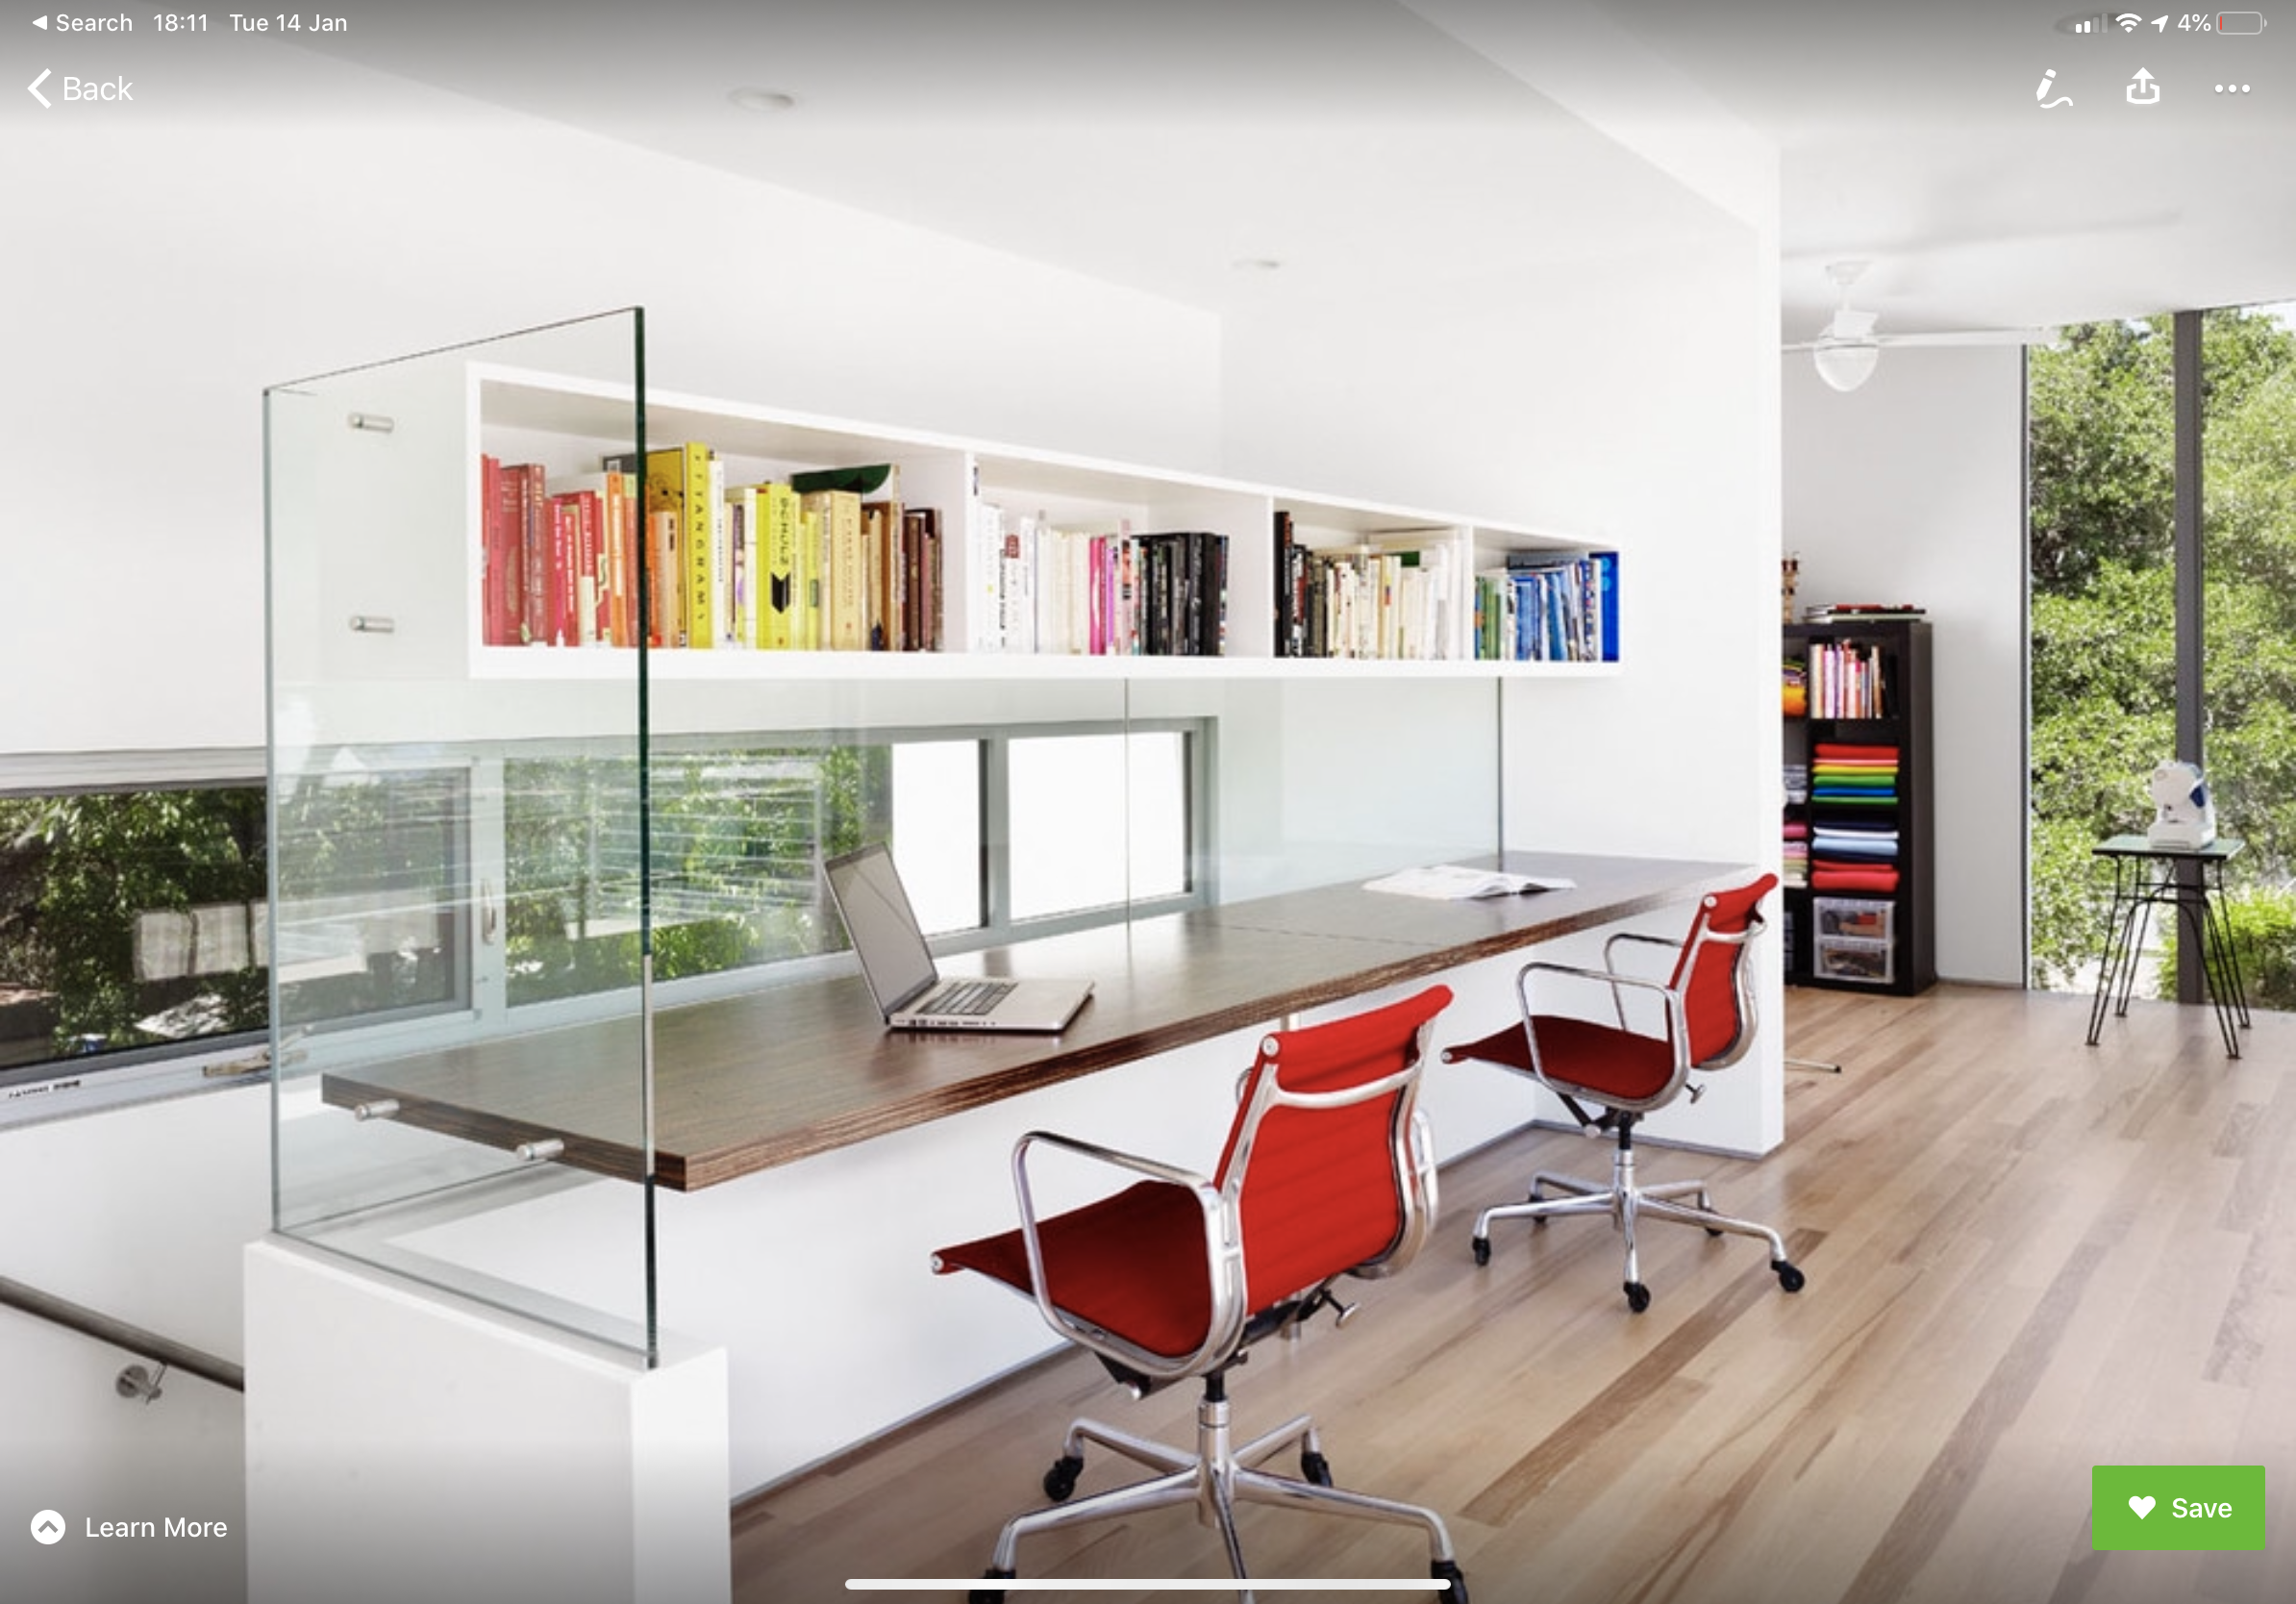 Built in Desk (study nook) material